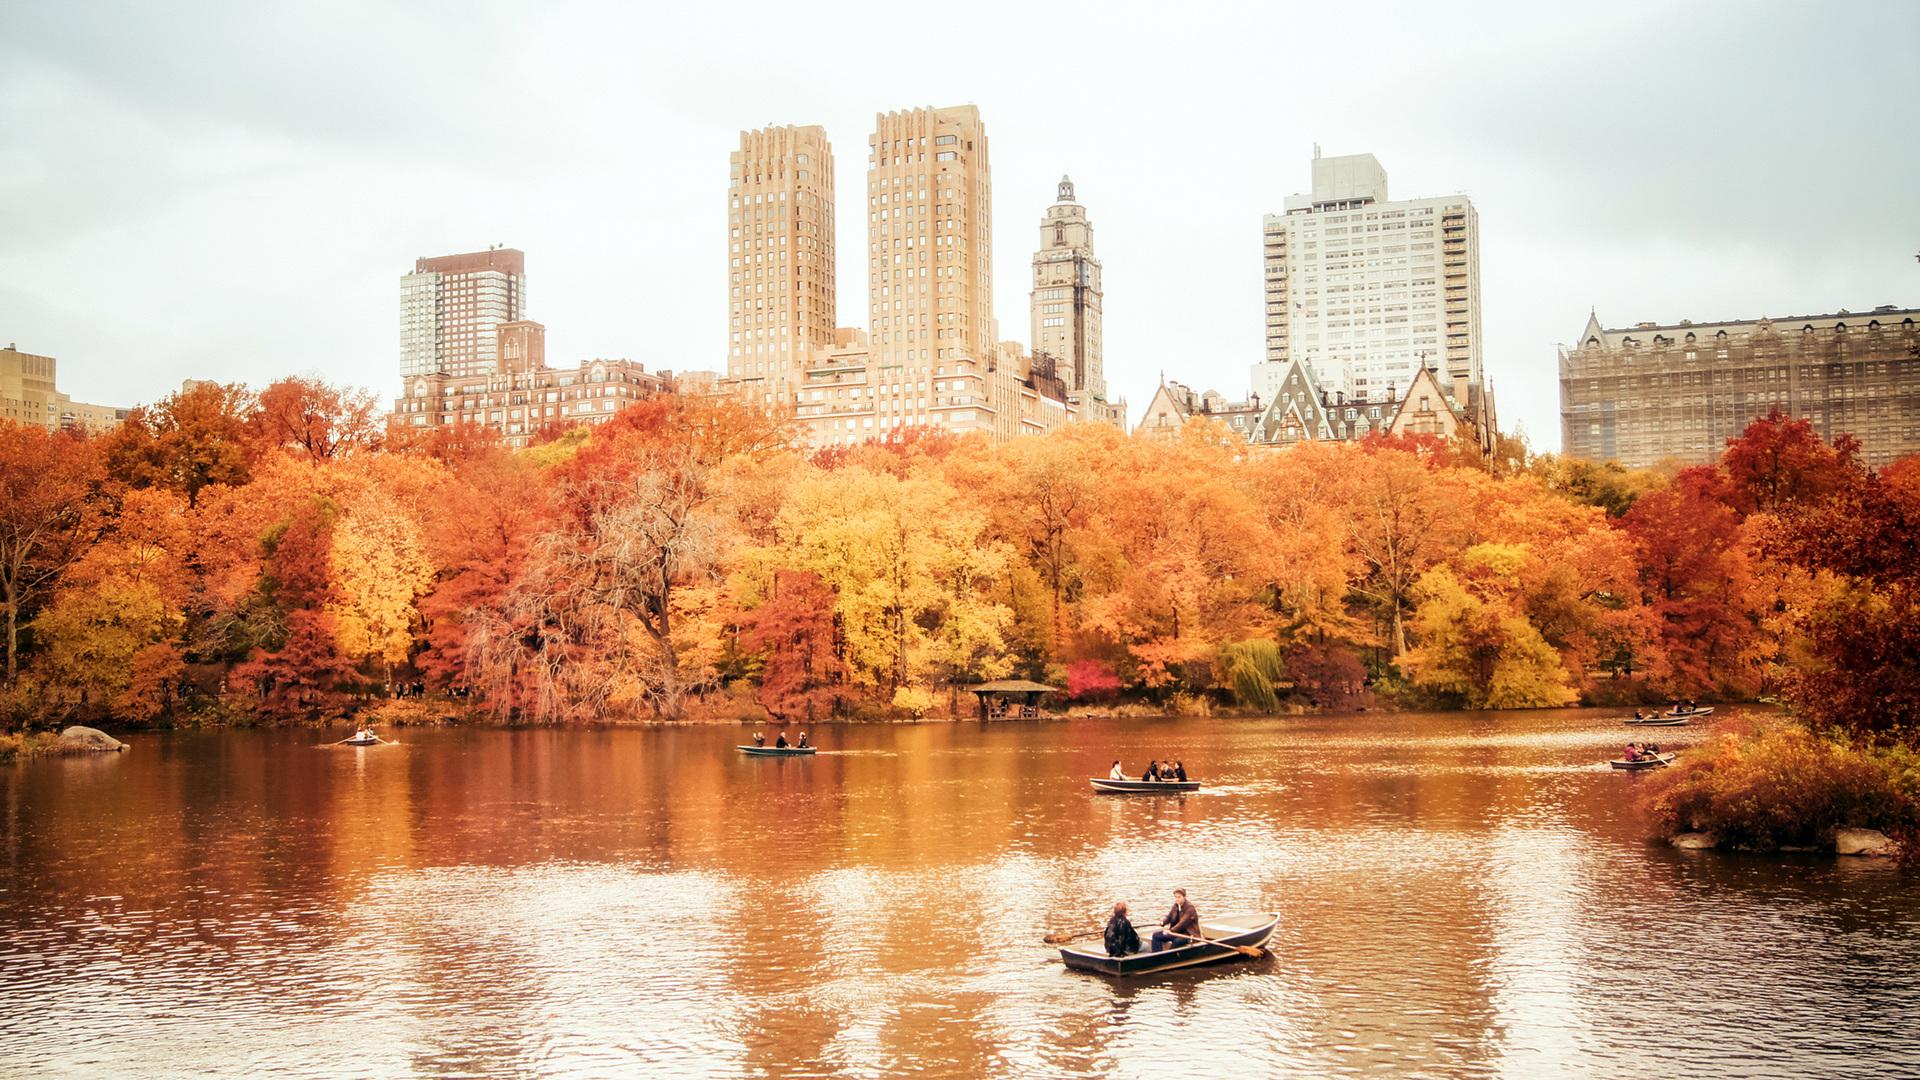 Usa, Manhattan, New York, Nyc, New York City, Manhattan, - New York Fall Wallpaper For Desktop - HD Wallpaper